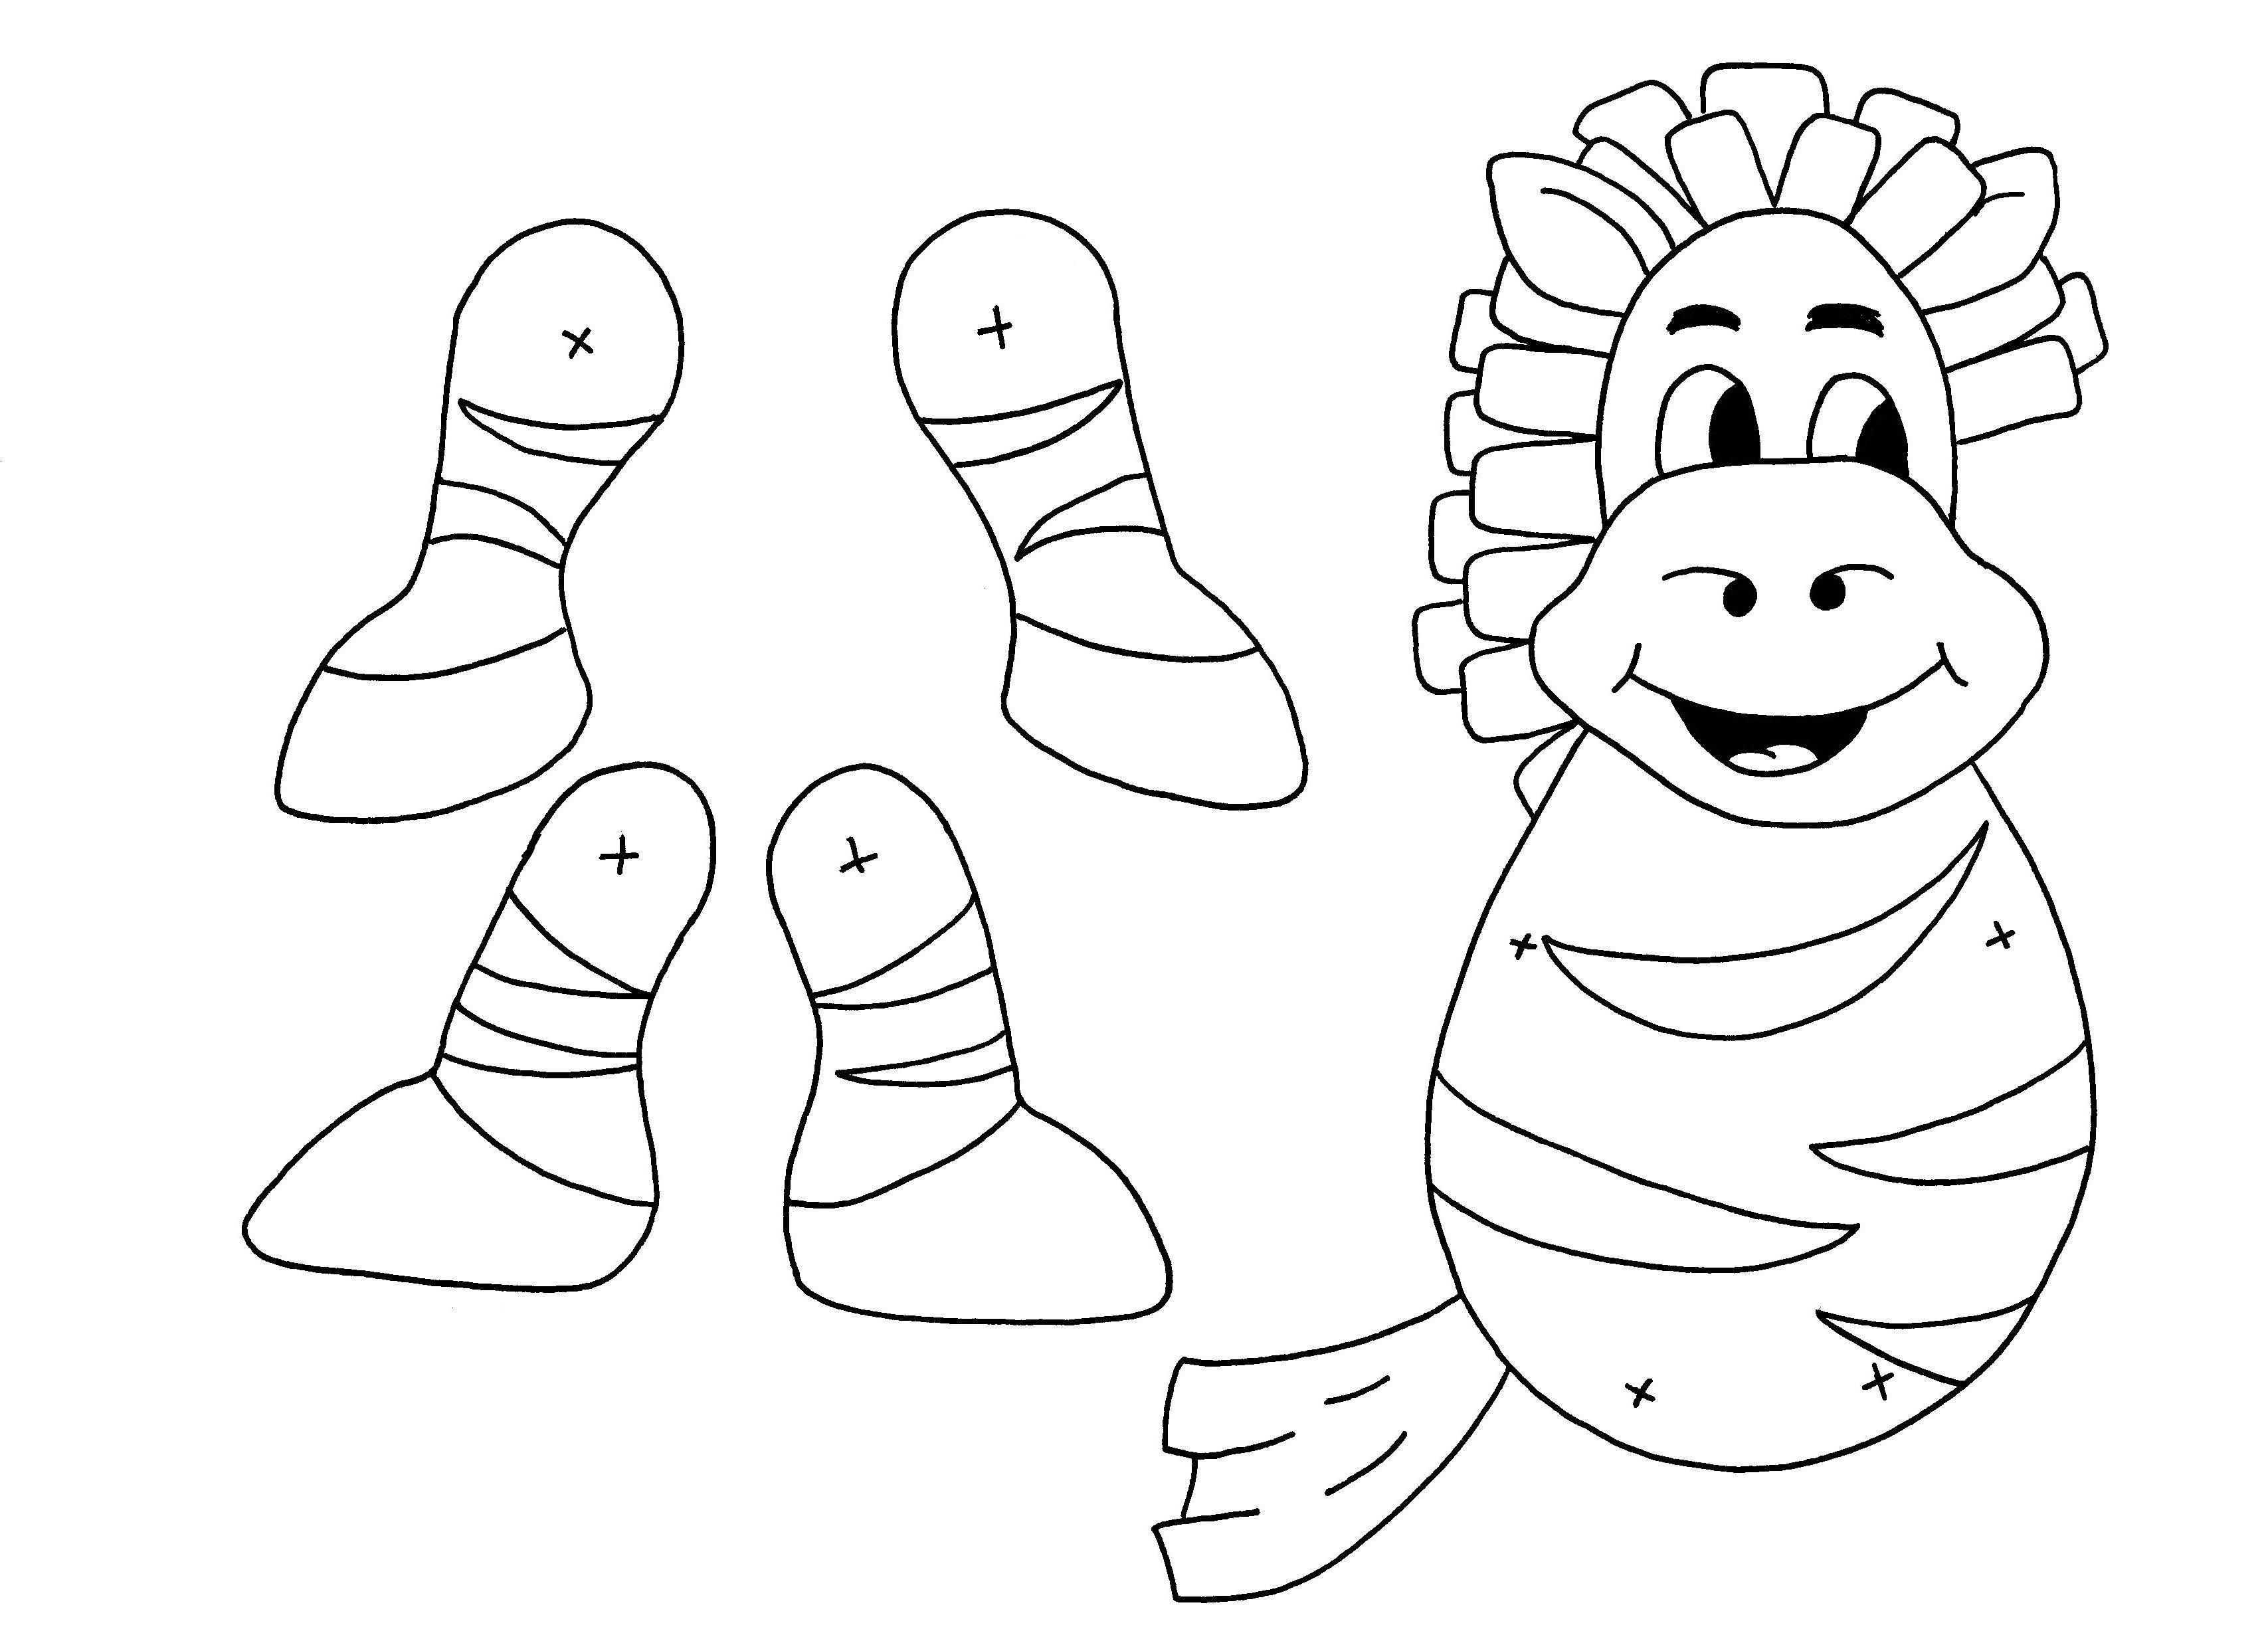 Zebra puppet from wwwanansi spidercom zvierata for Tiger puppet template